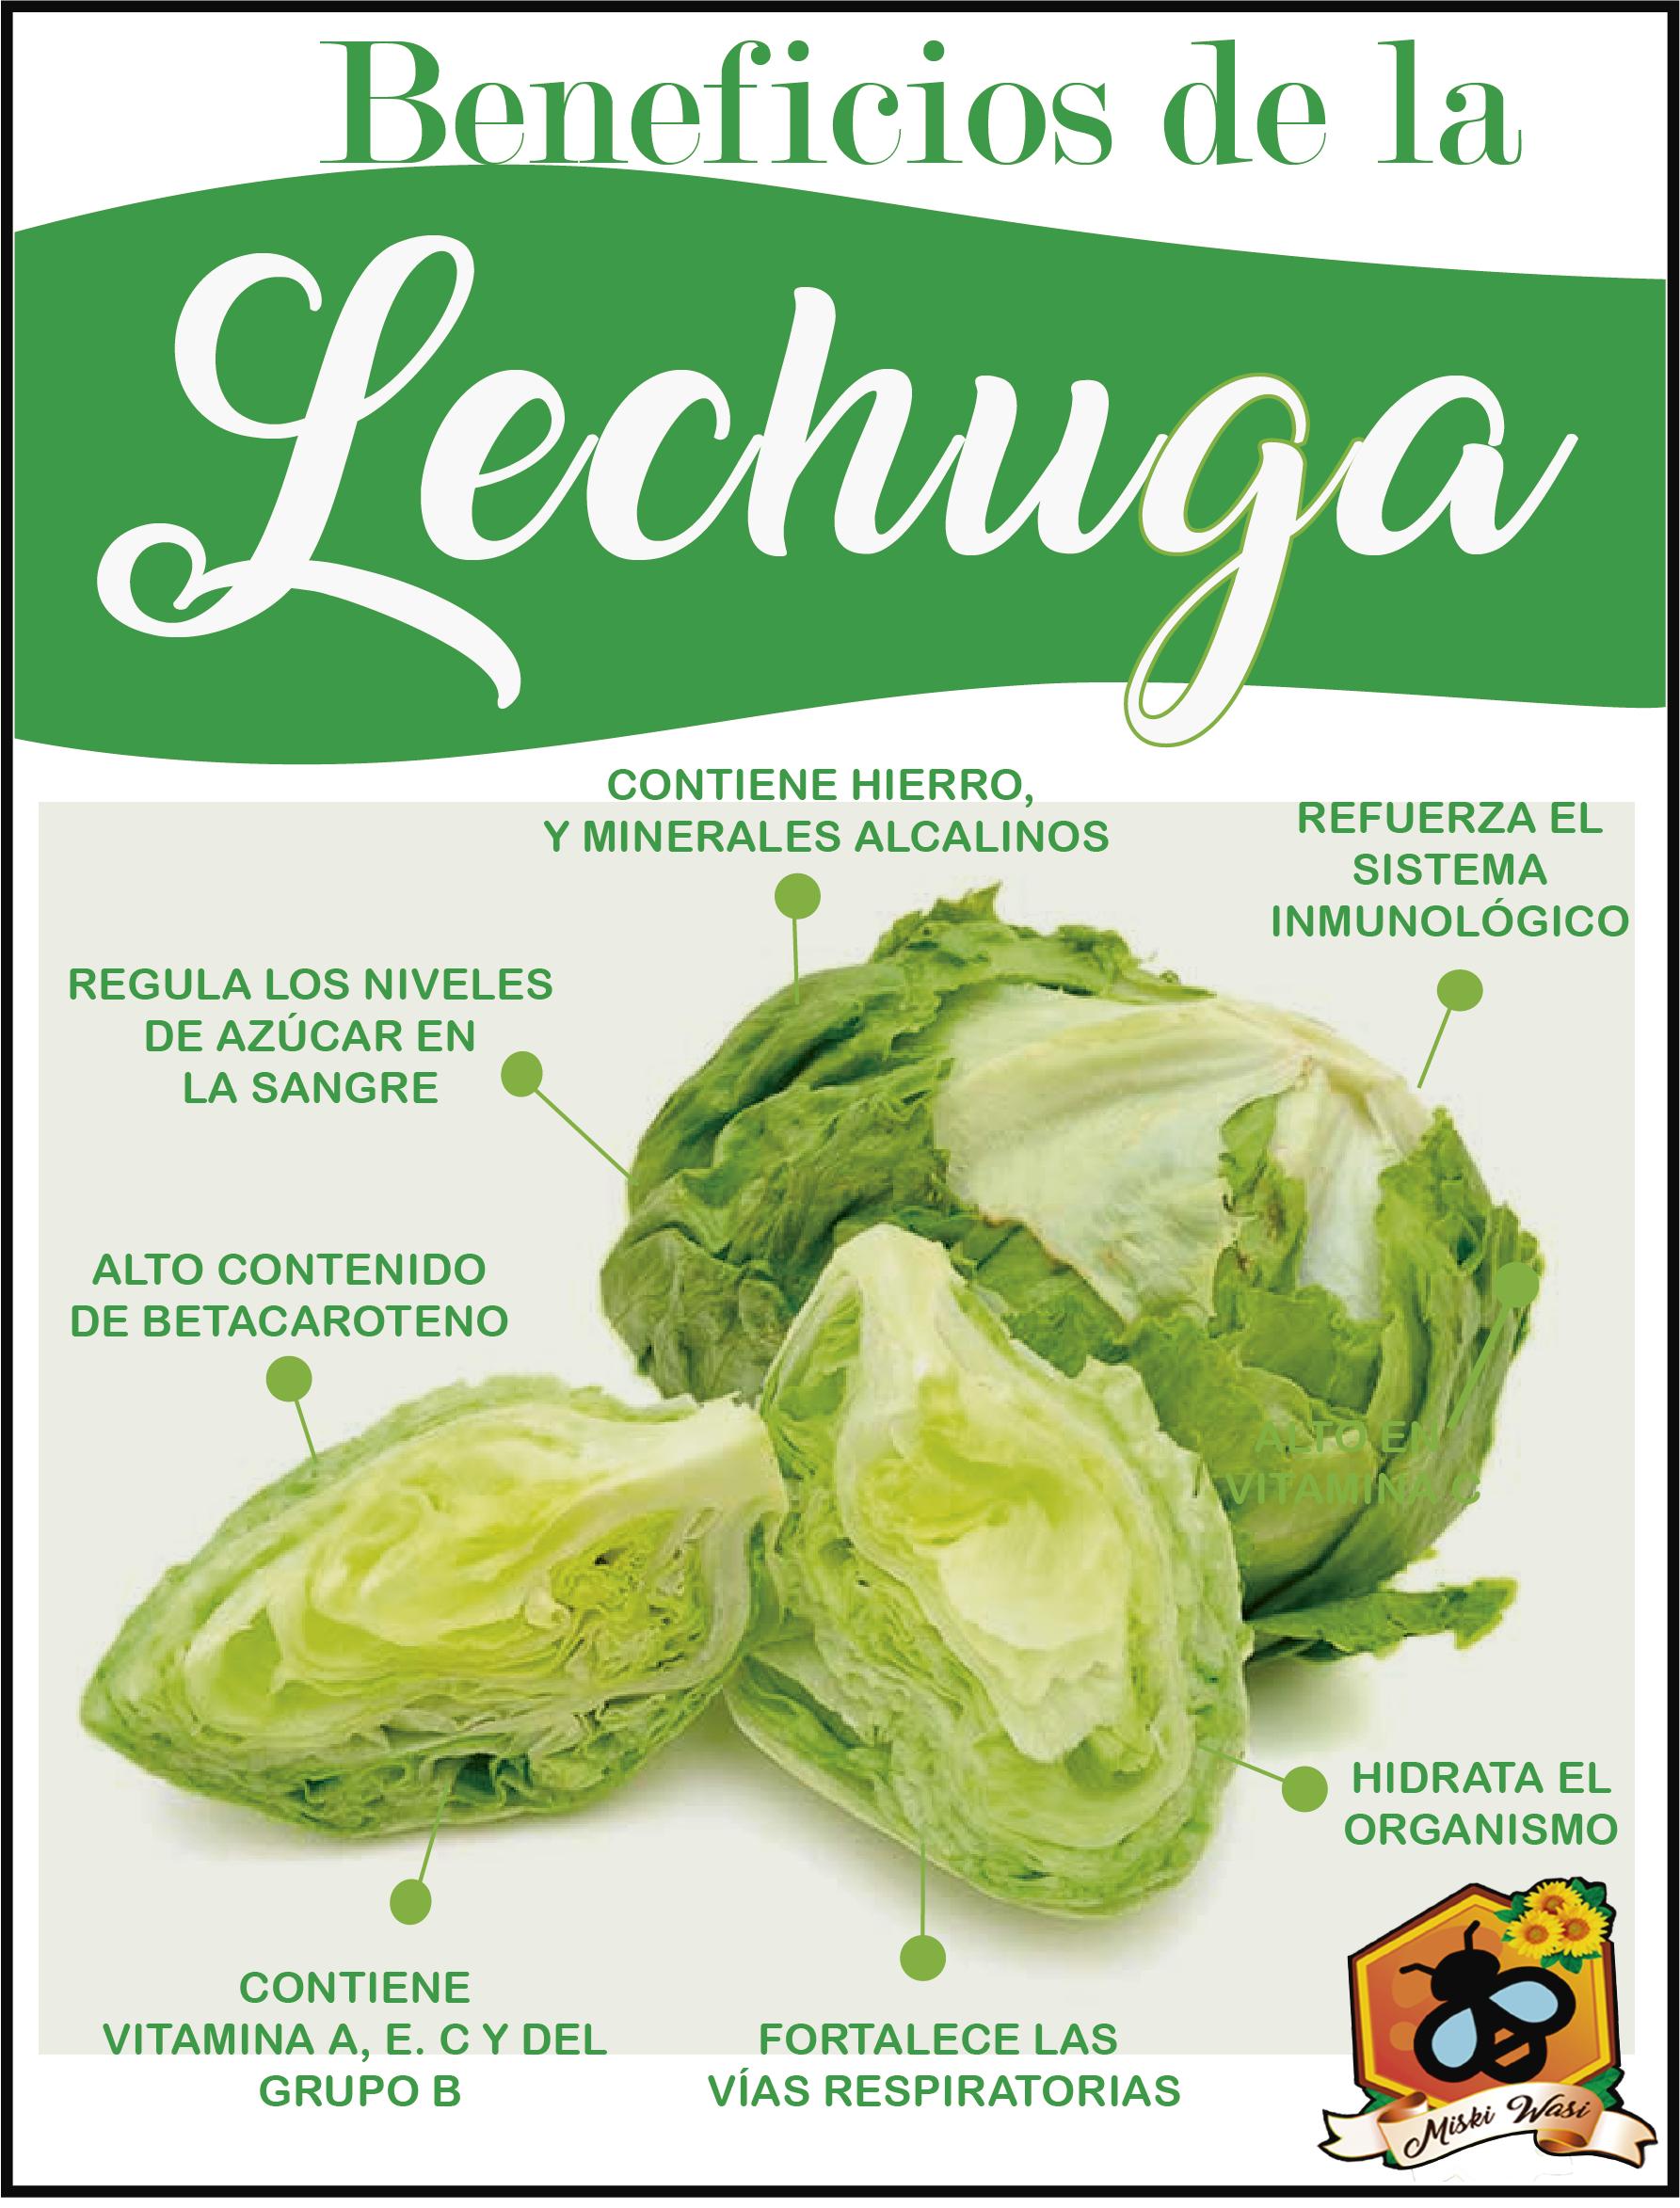 Beneficios De La Lechuga Beneficios De La Lechuga Frutas Y Verduras Beneficios Beneficios De Alimentos